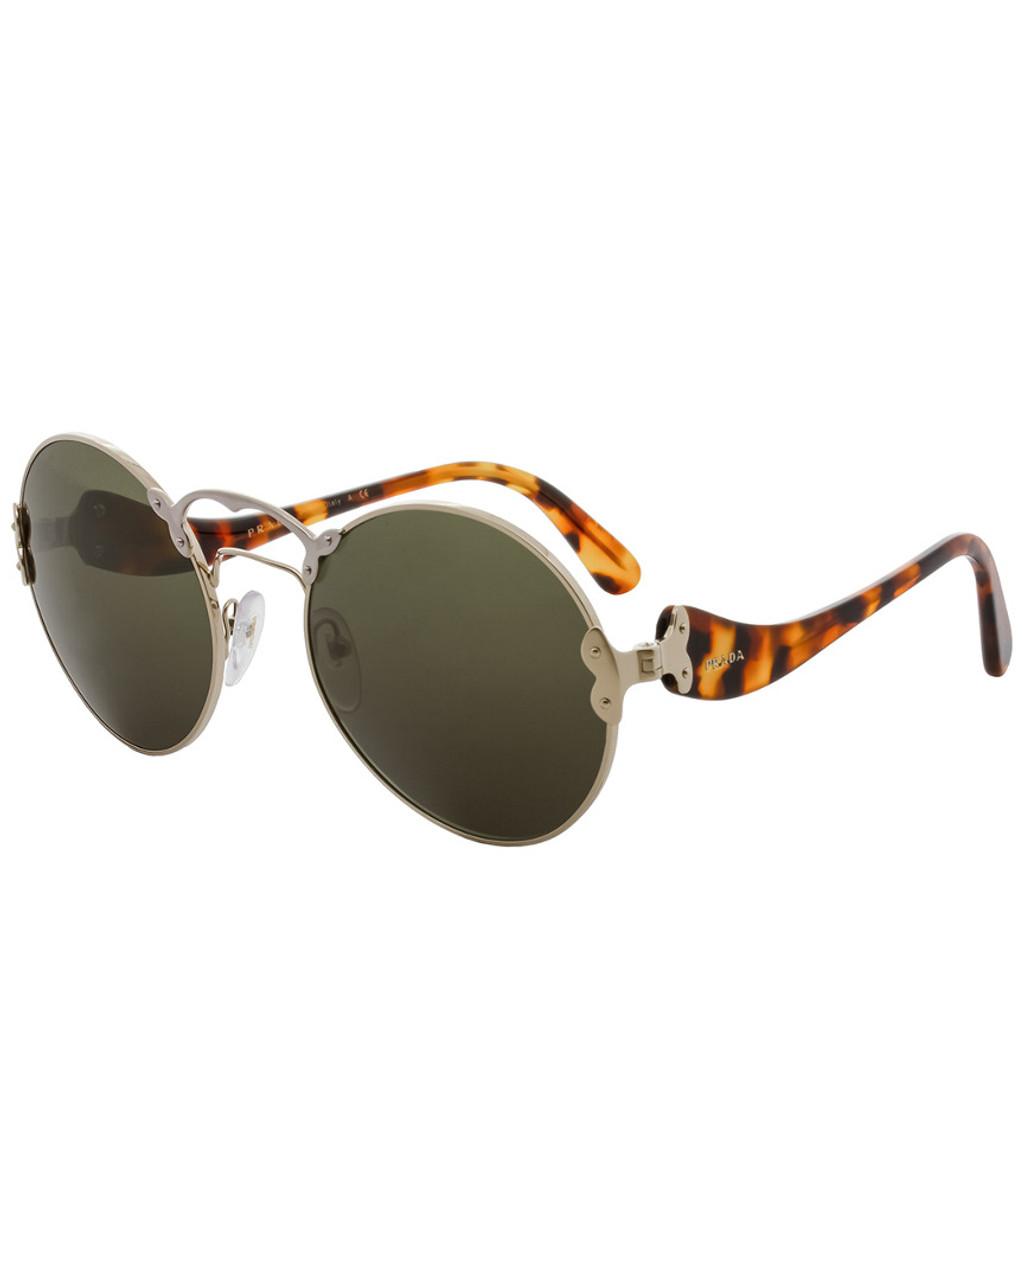 a30799cfc9 Prada Women s PR 55TS 57mm Sunglasses~1111401812 - Carsons